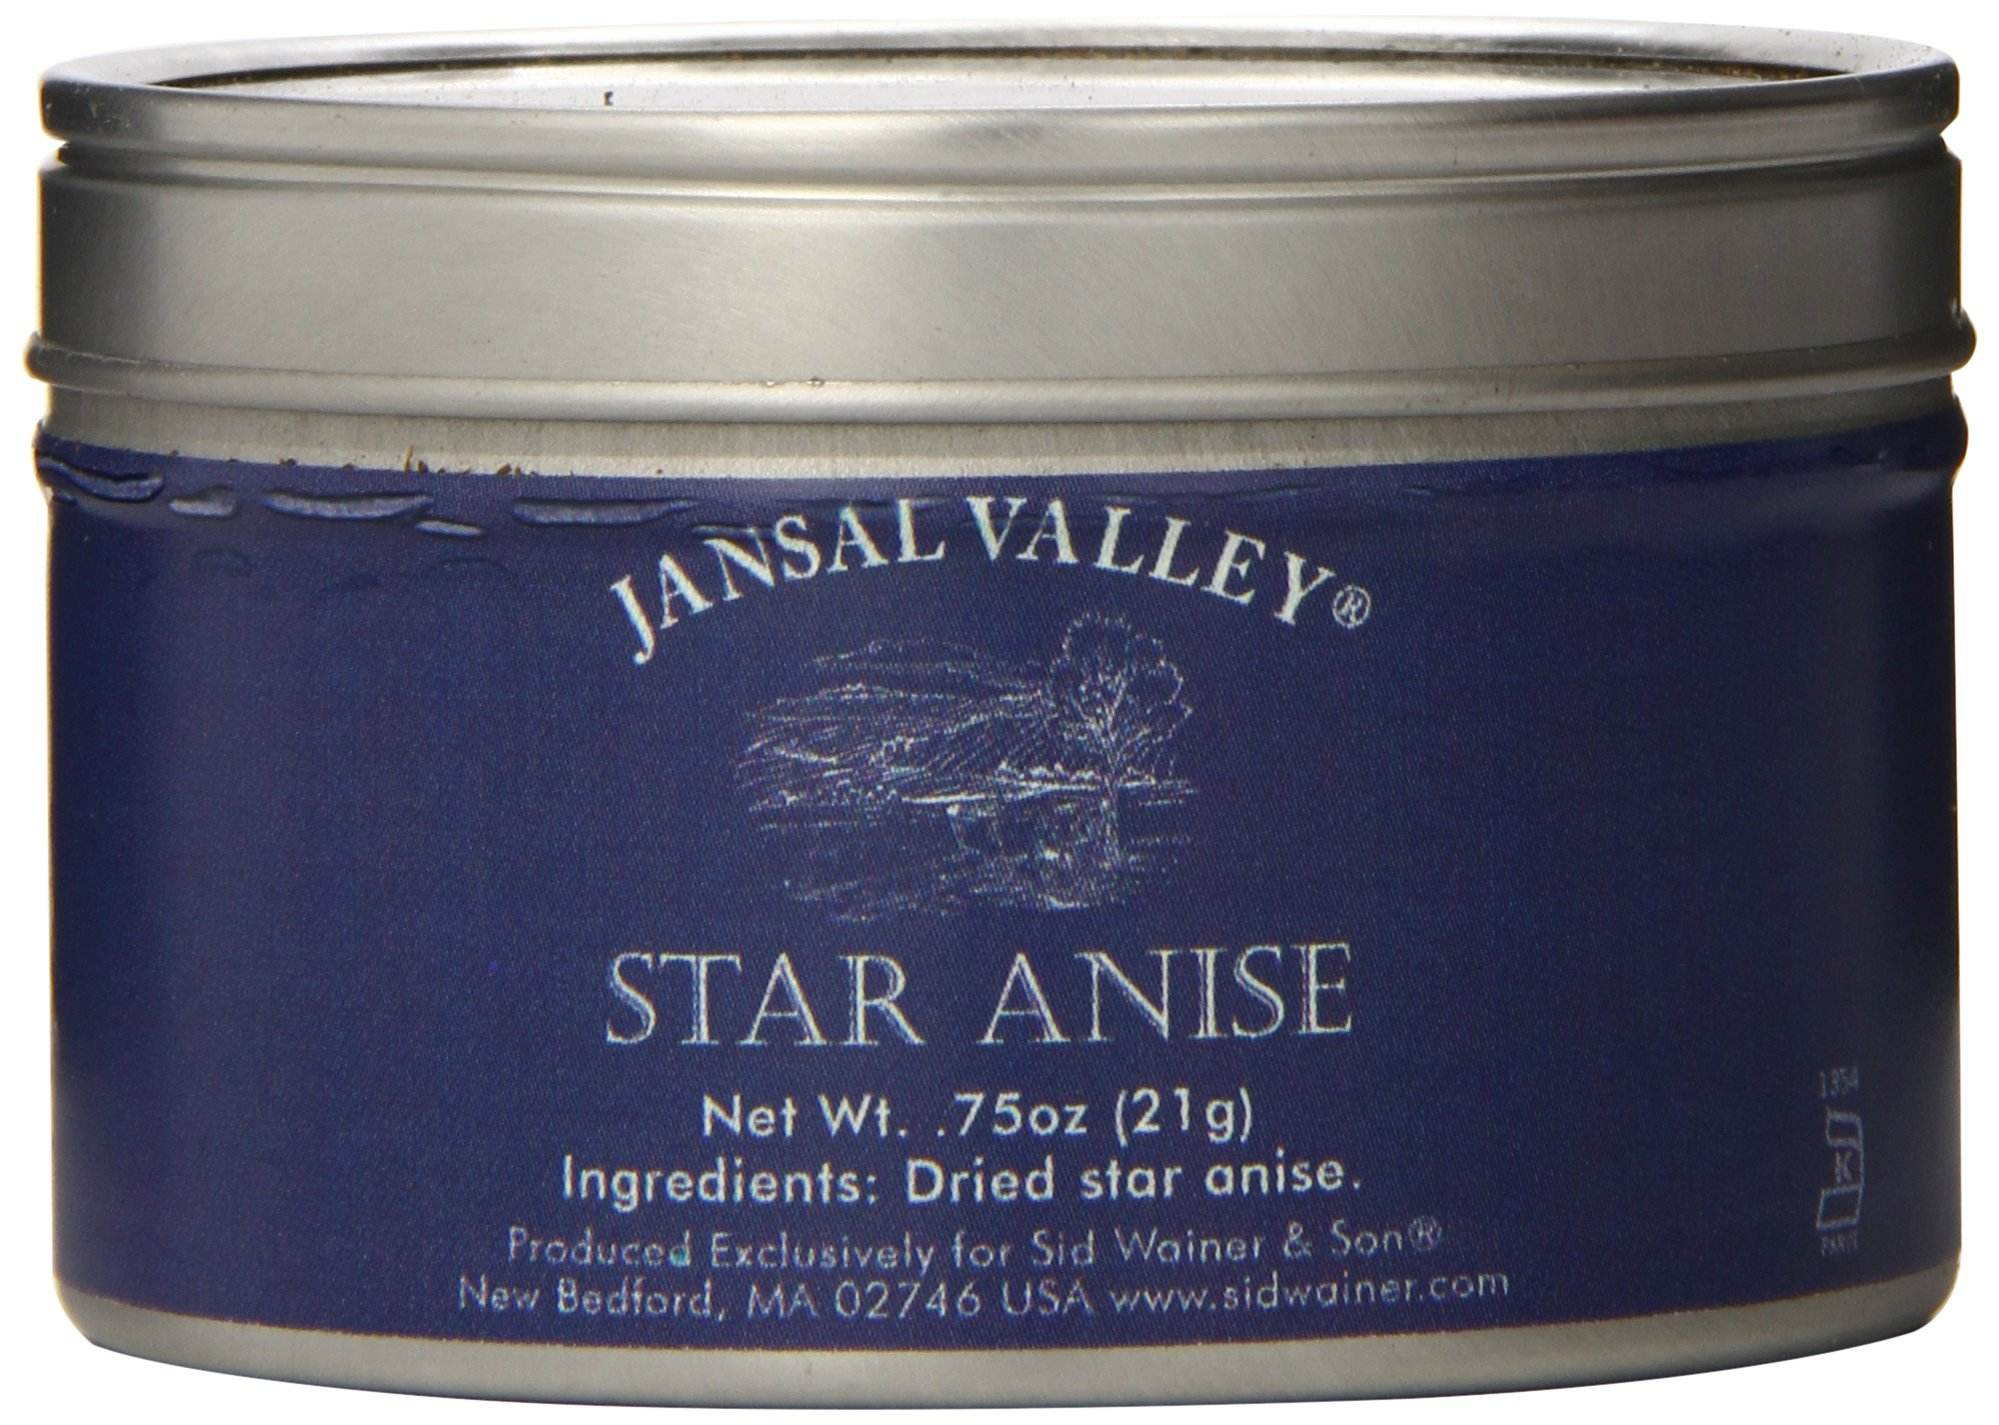 Jansal Valley Star Anise, 0.75 Ounce (Pack of 6)